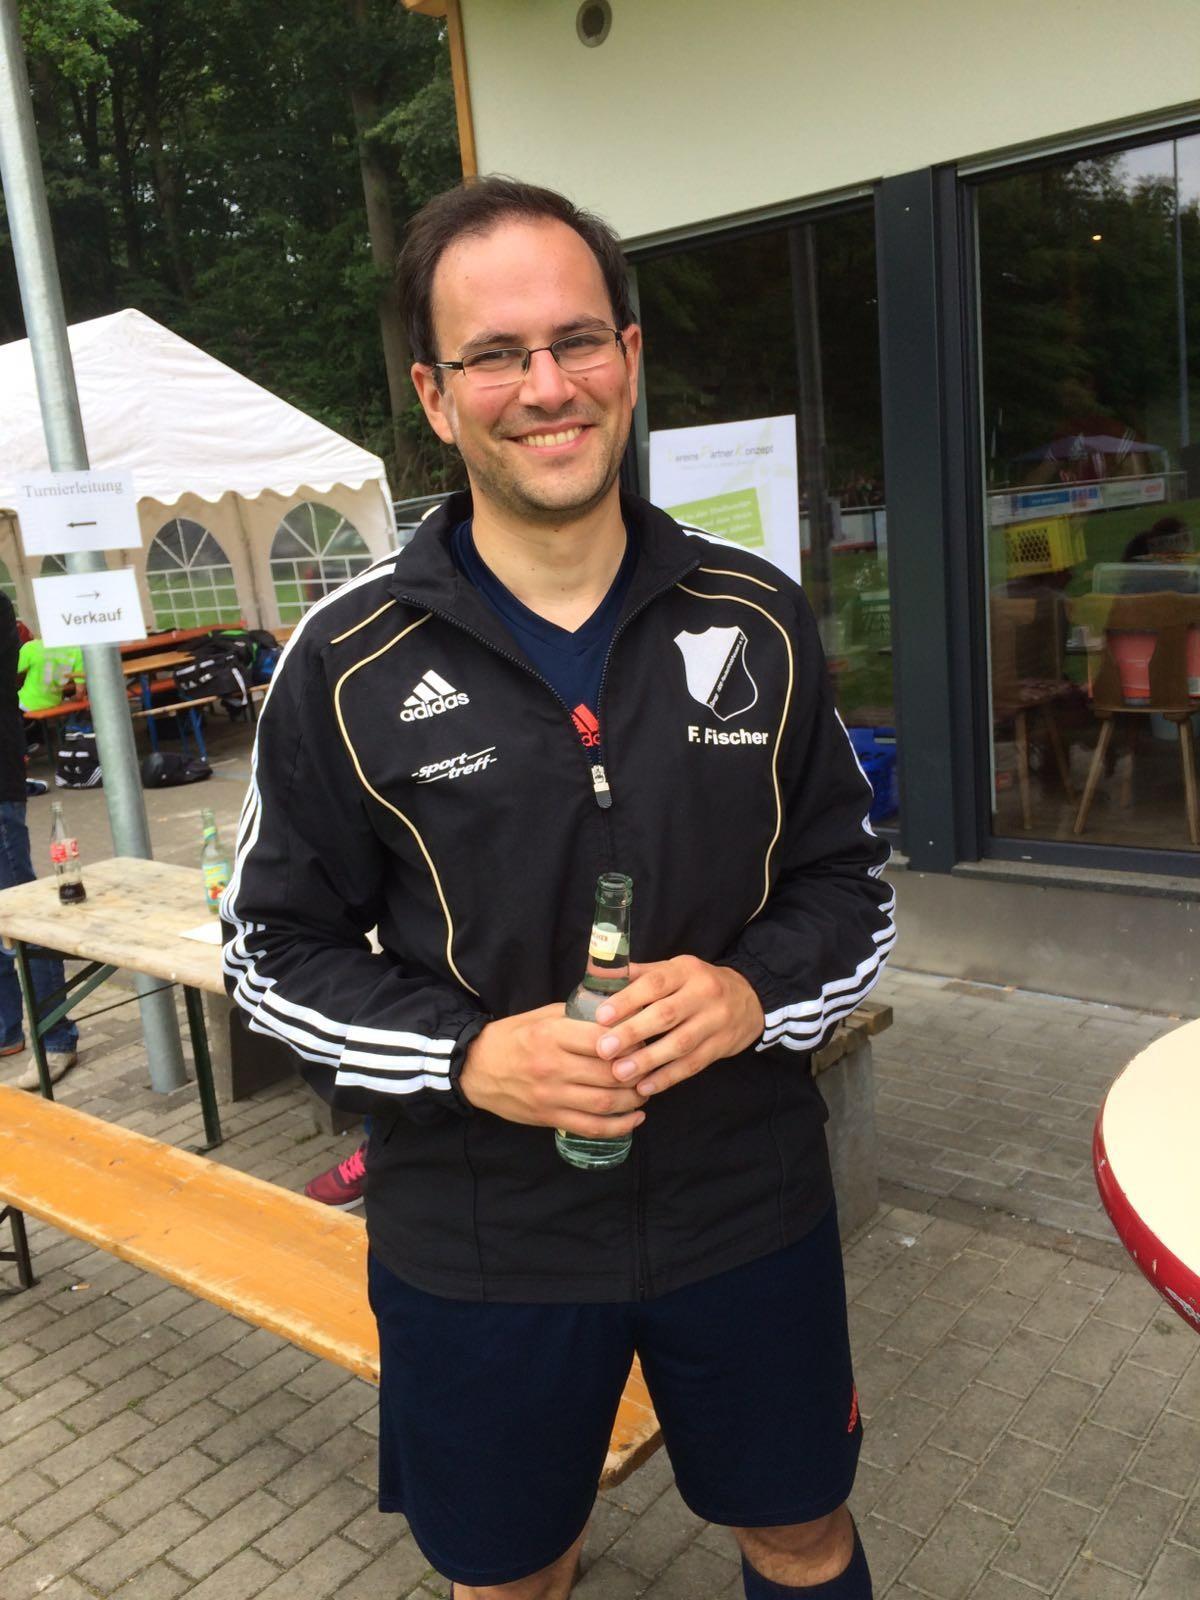 Ohne Schiedsrichter geht auch bei der Jugend nichts - Danke Florian